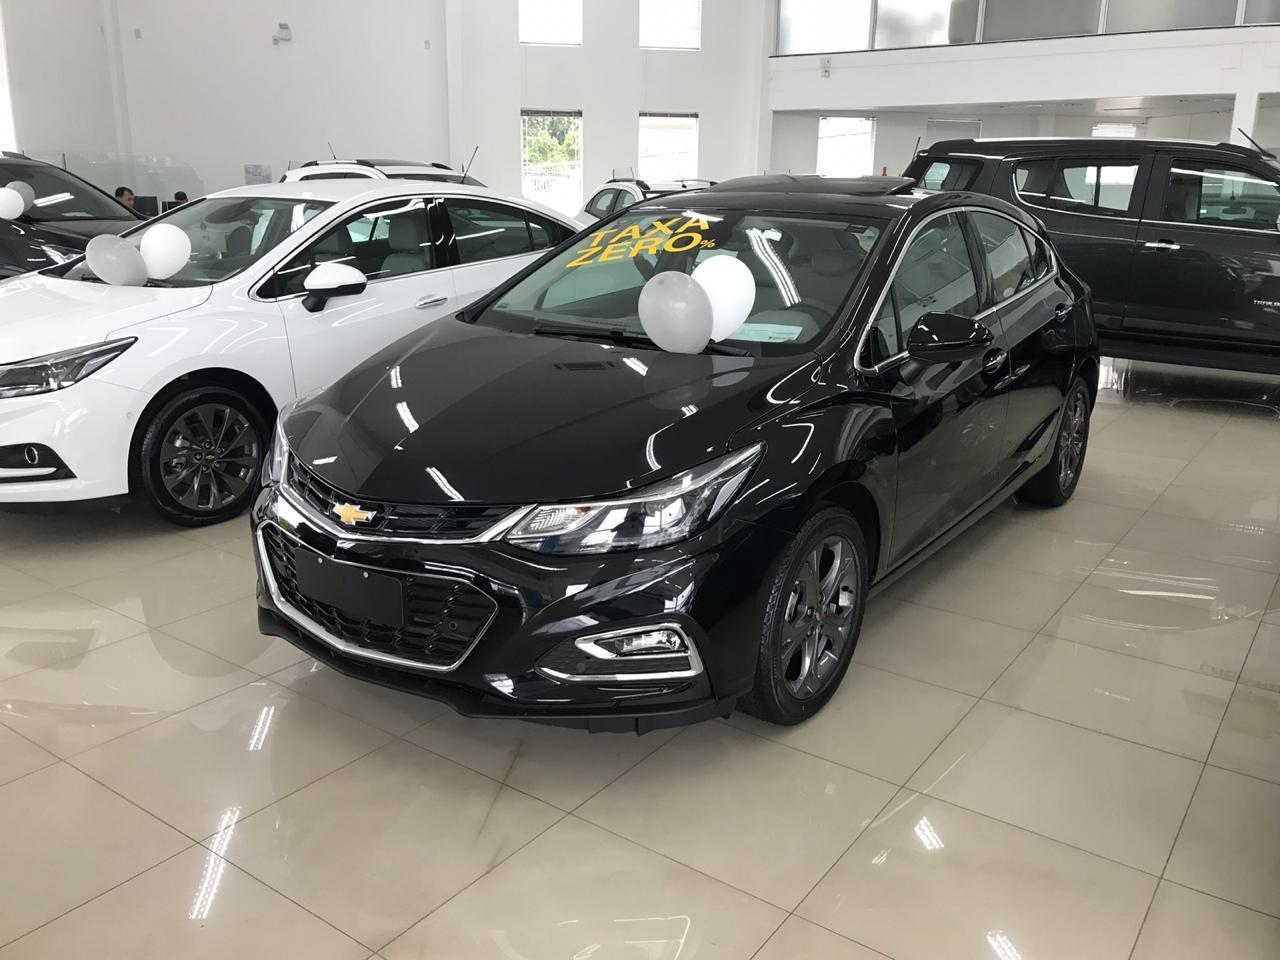 Chevrolet I/CHEV CRUZE LTZ HB AT ZERO KM 1.4 2018